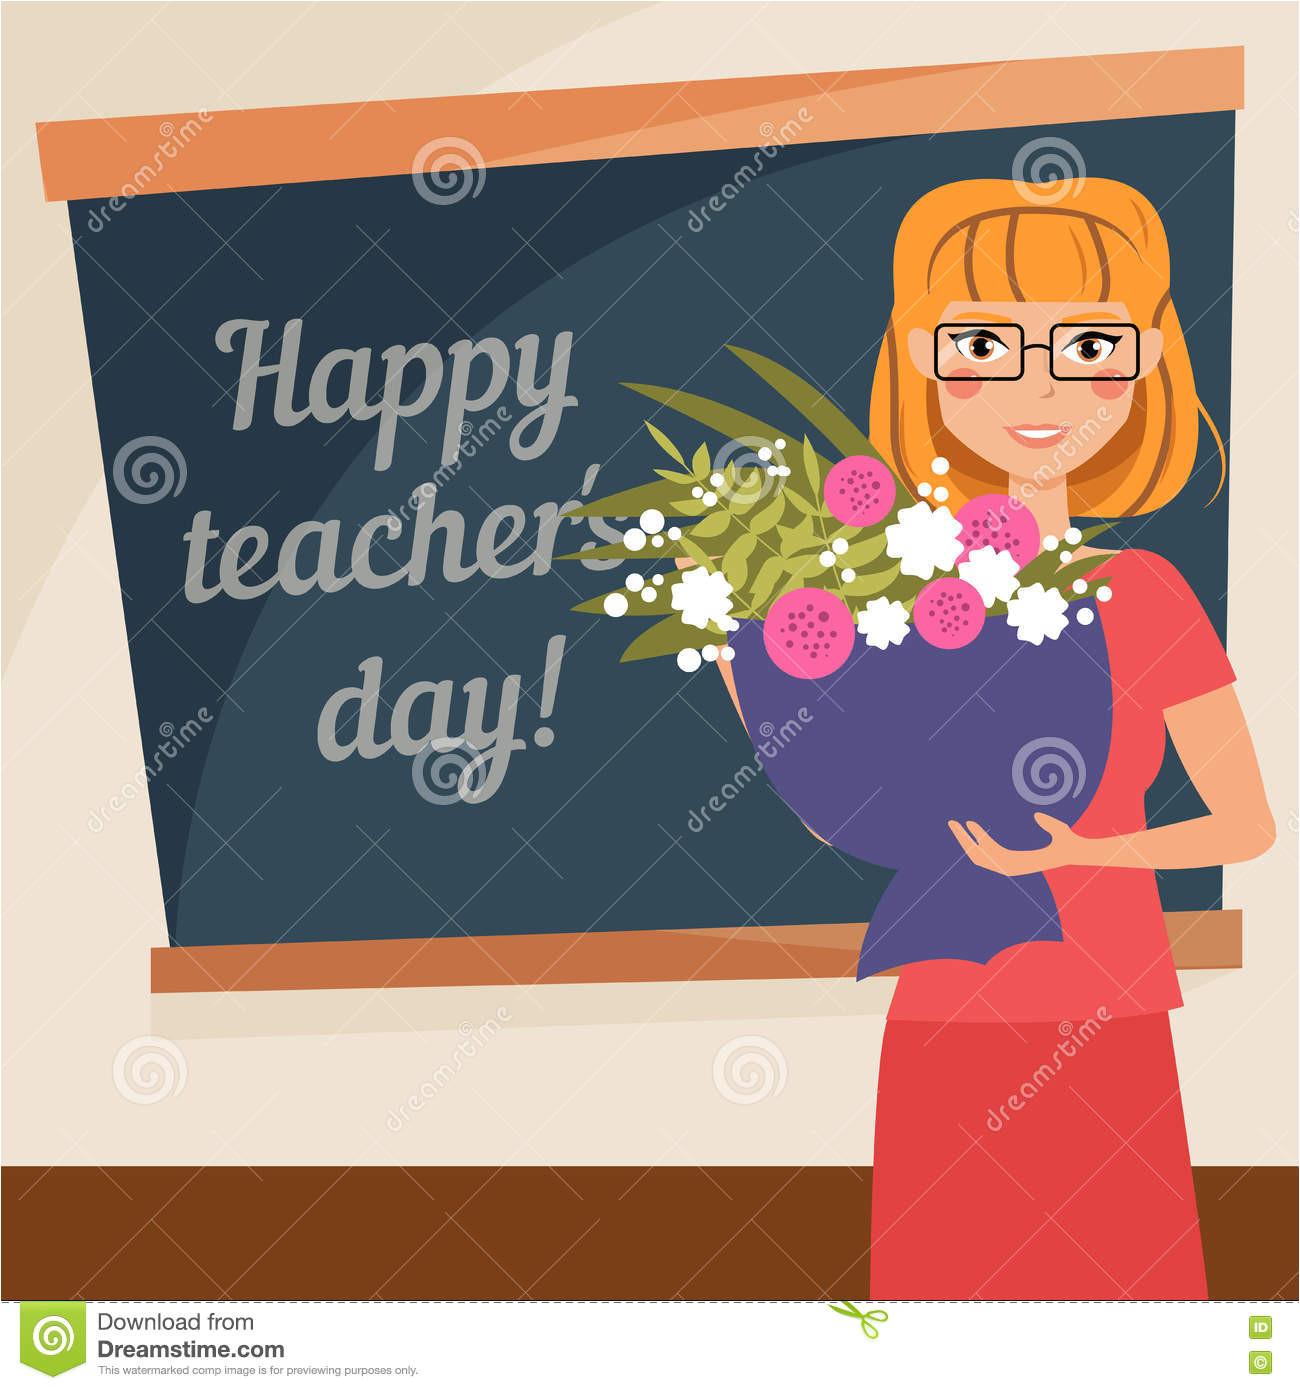 happy teachers day card vector illustration cartoon character 78198301 jpg